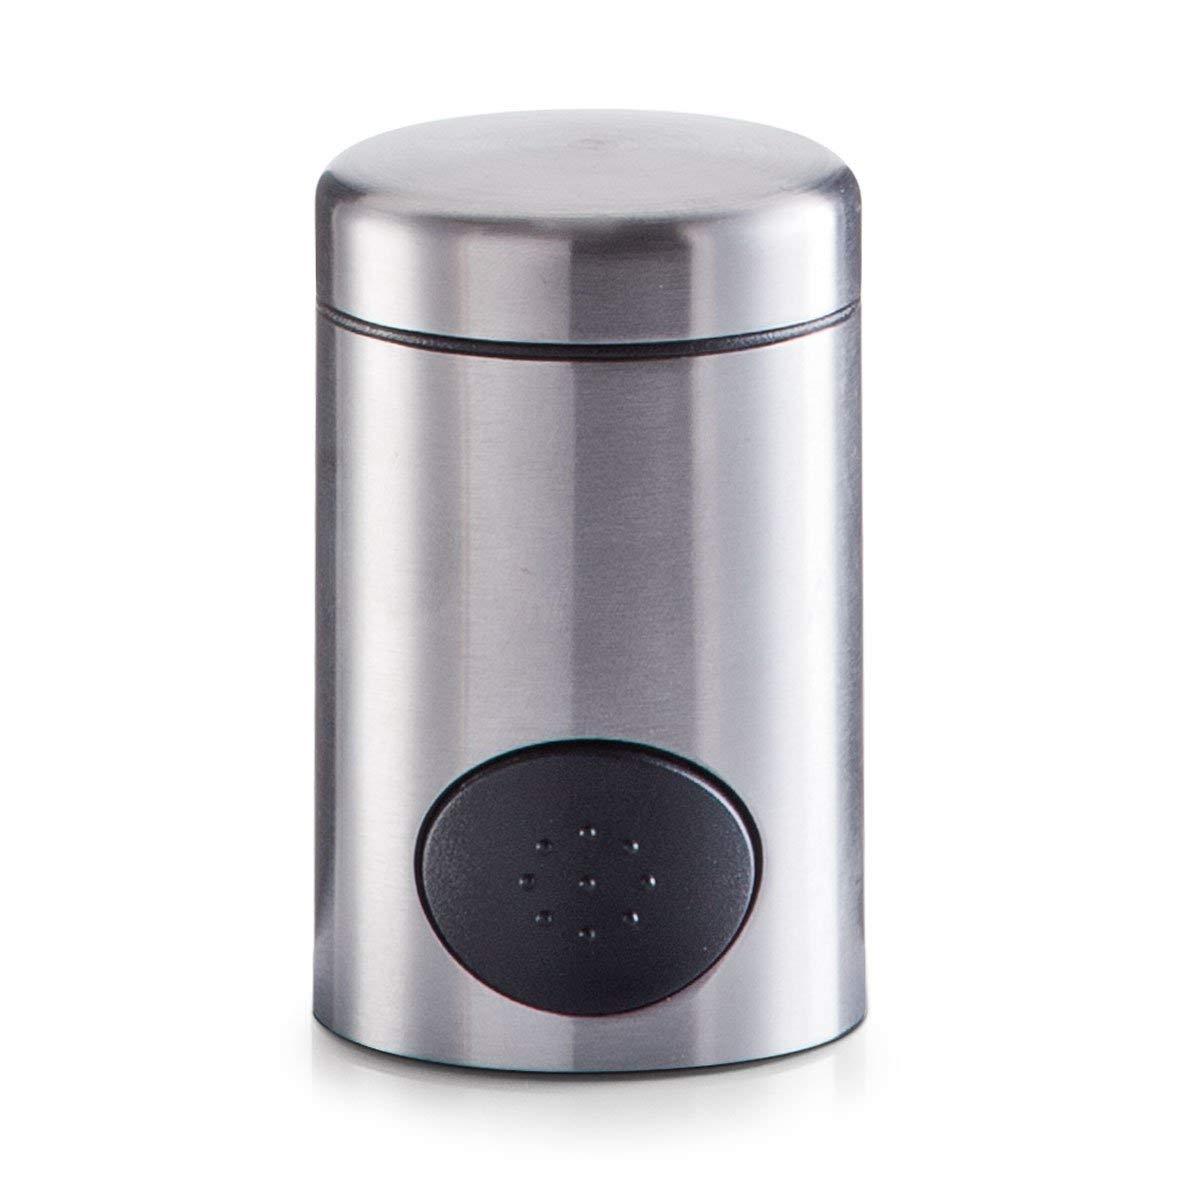 27311 Süßstoff-Spender Edelstahl ø 4.7 x 7.5 cm Zeller